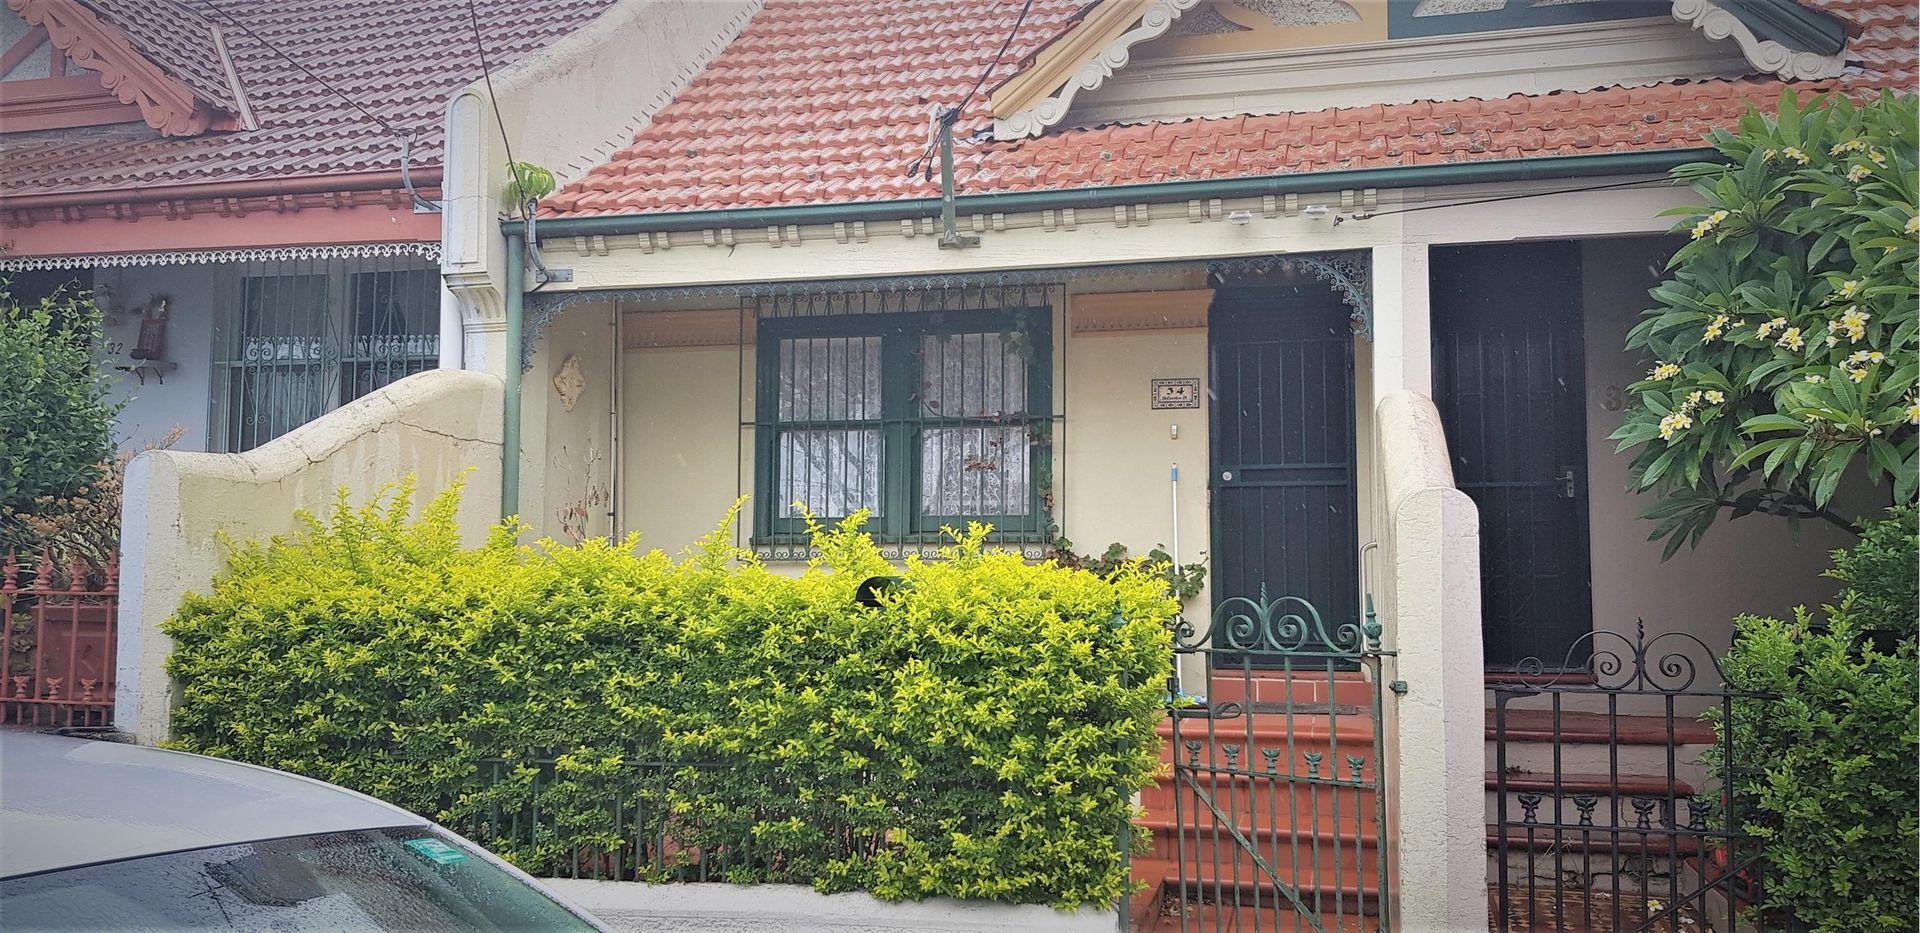 34  Yelverton, Sydenham NSW 2044, Image 0